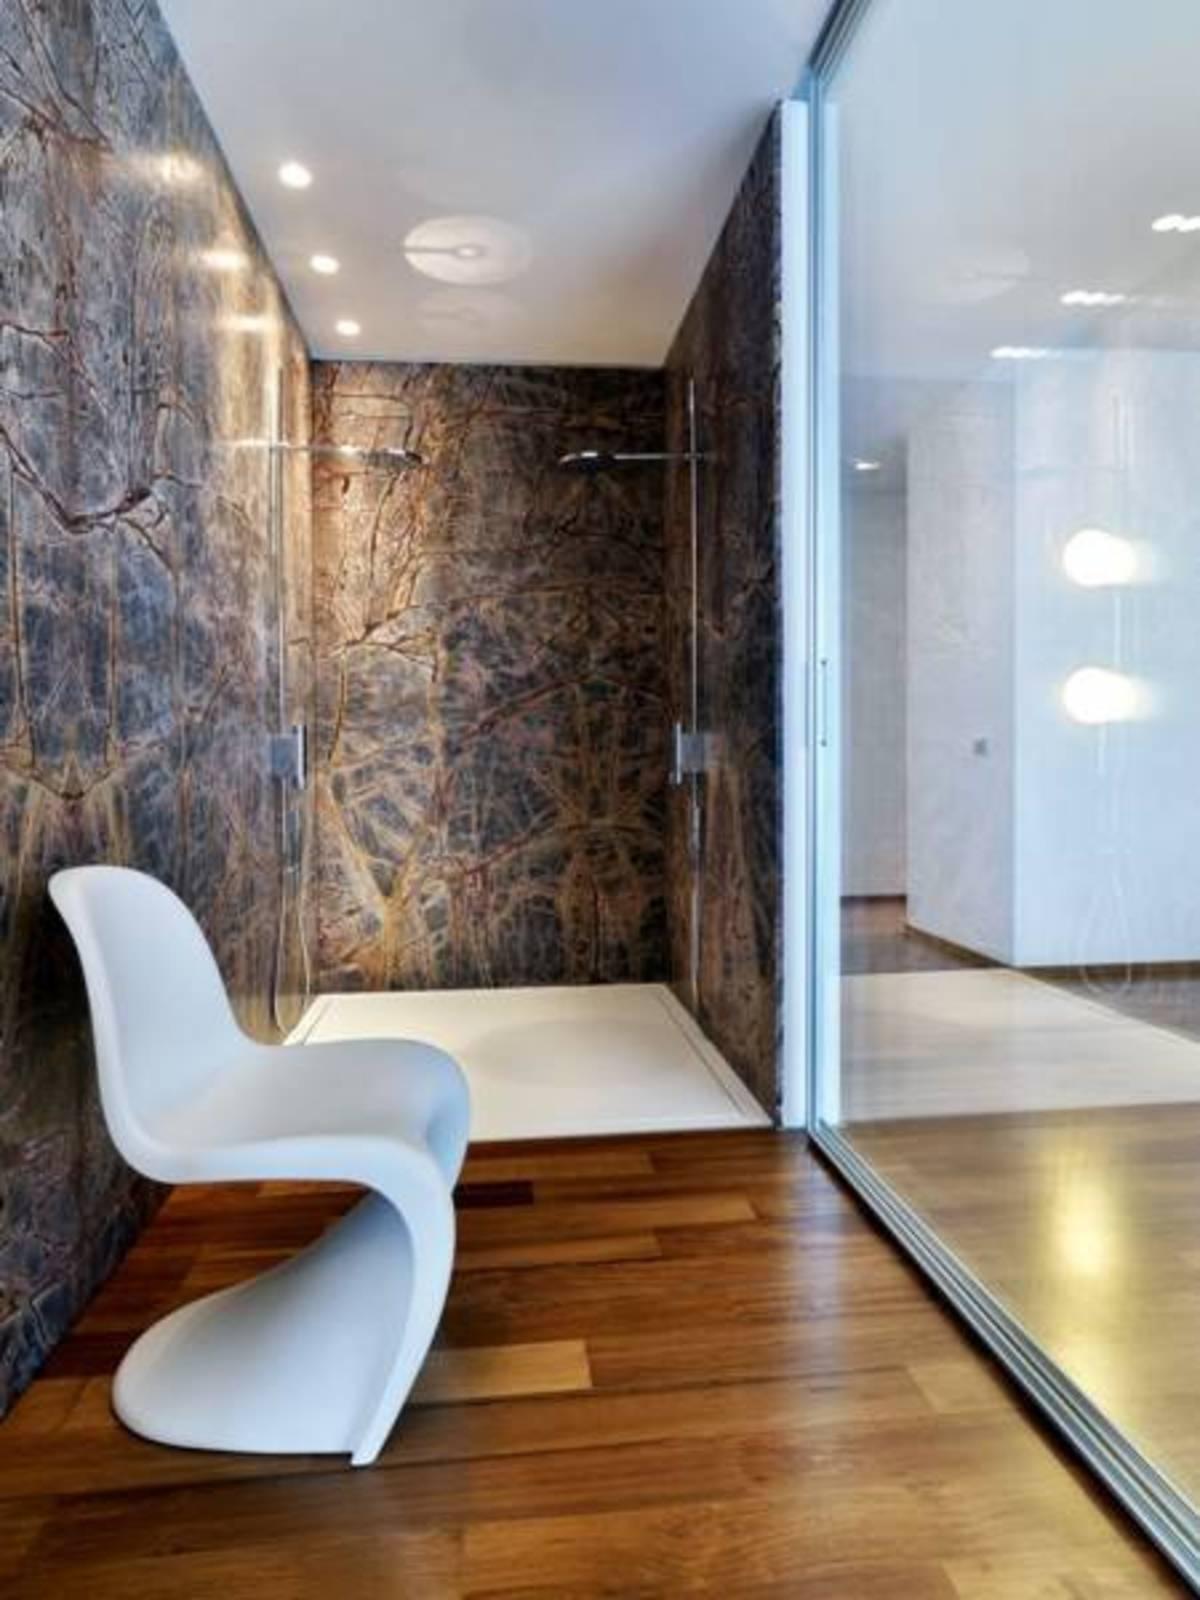 Horizontal Space Damilanostudio Architects Floornature - Horizontal-space-by-duilio-damilano